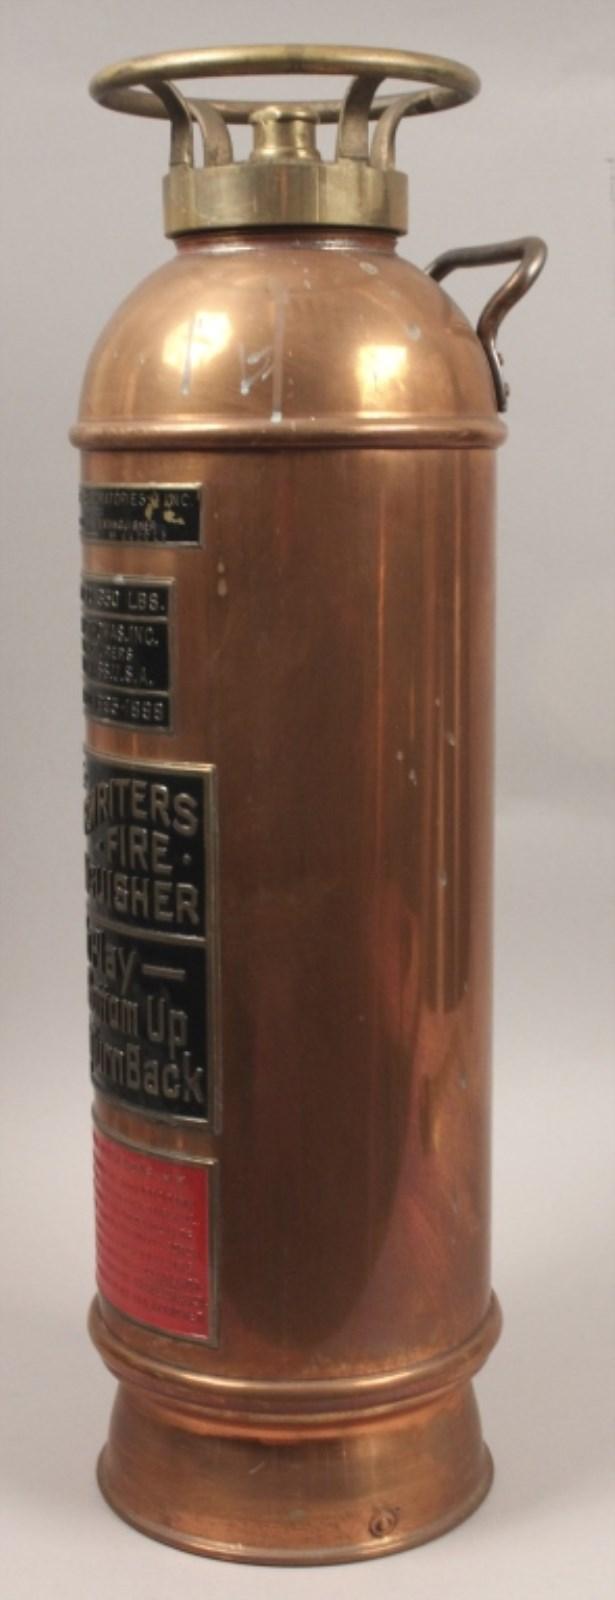 Antique Underwriters Labs Copper Fire Extinguisher